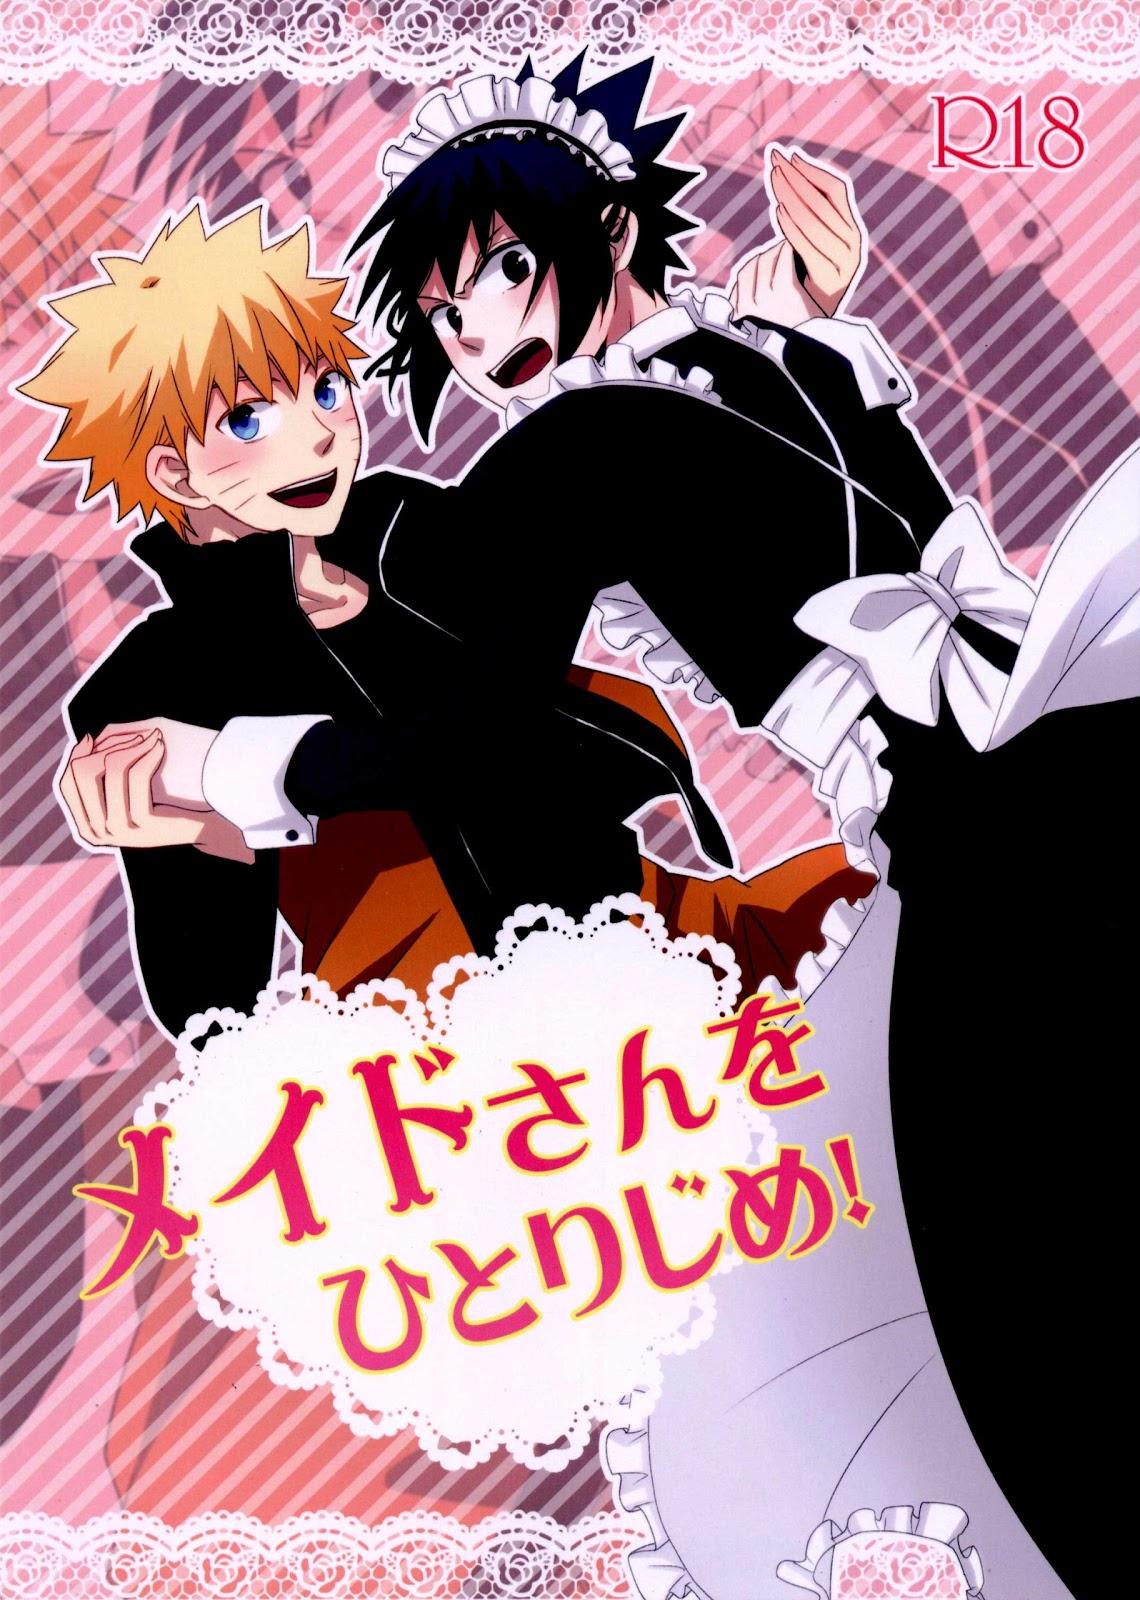 manga-yaoy-furri